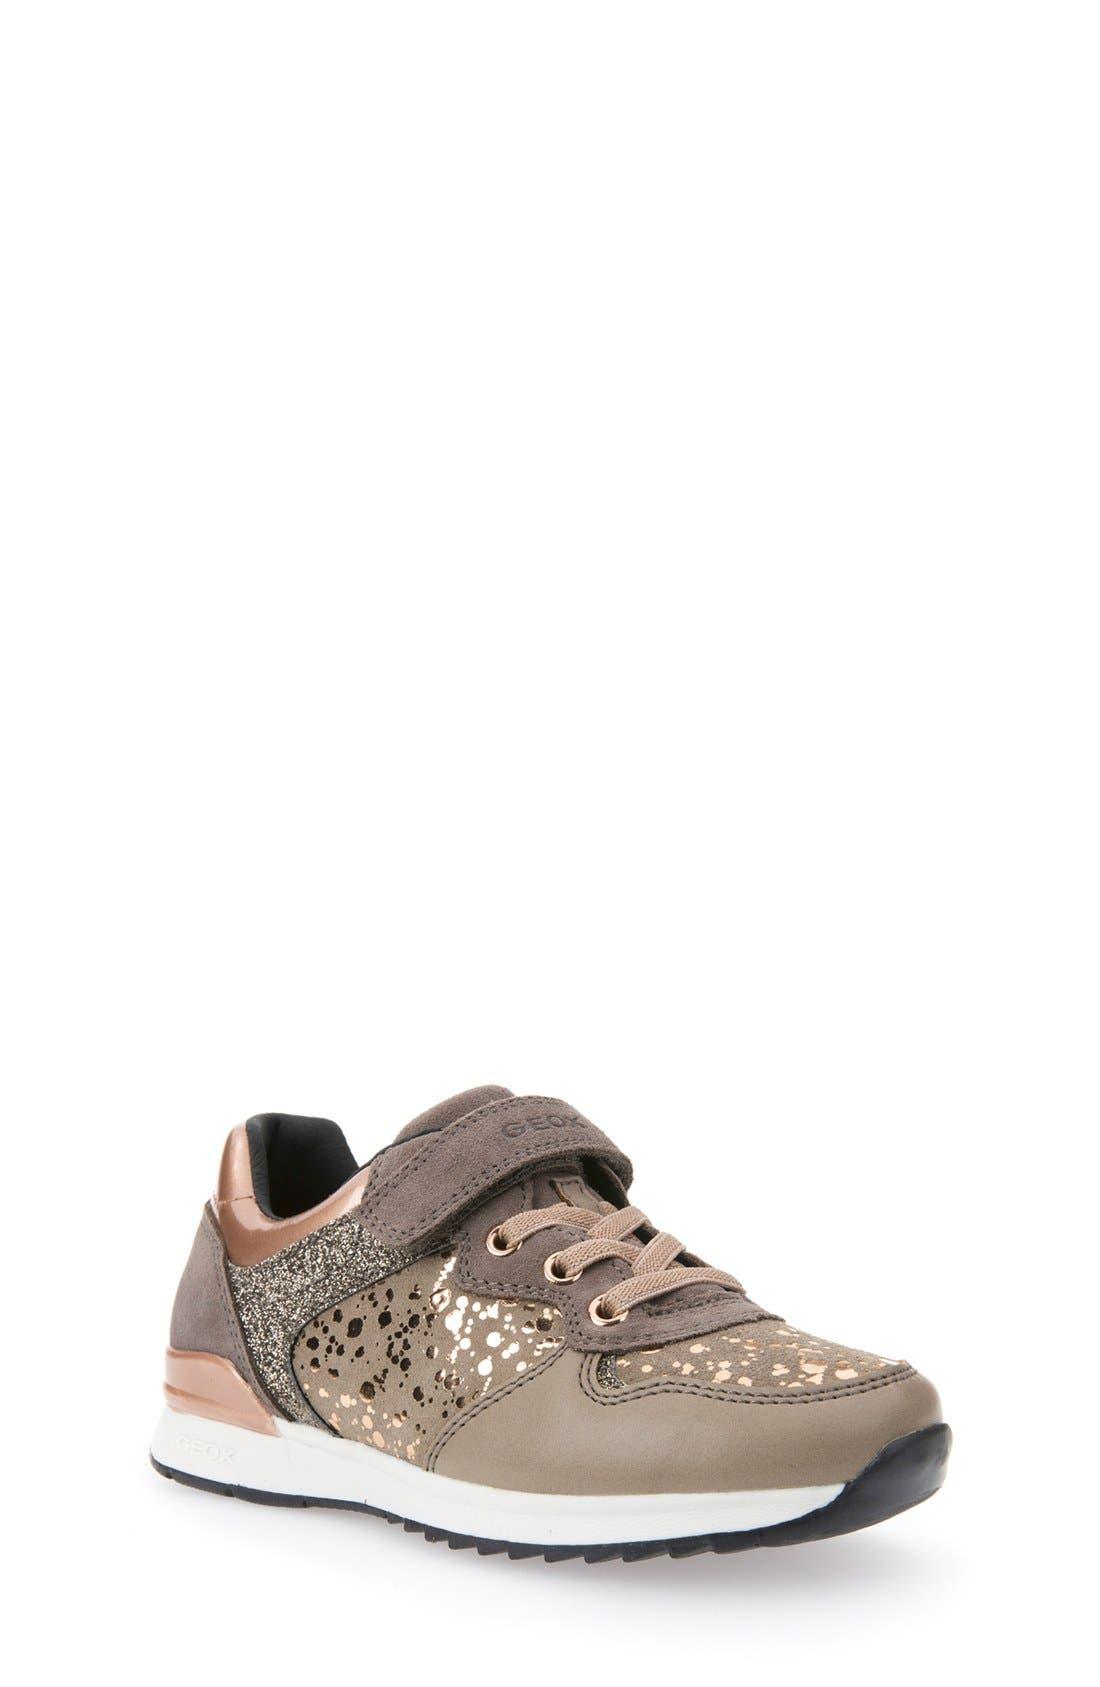 Maisie Sneaker,                         Main,                         color, Dark Beige